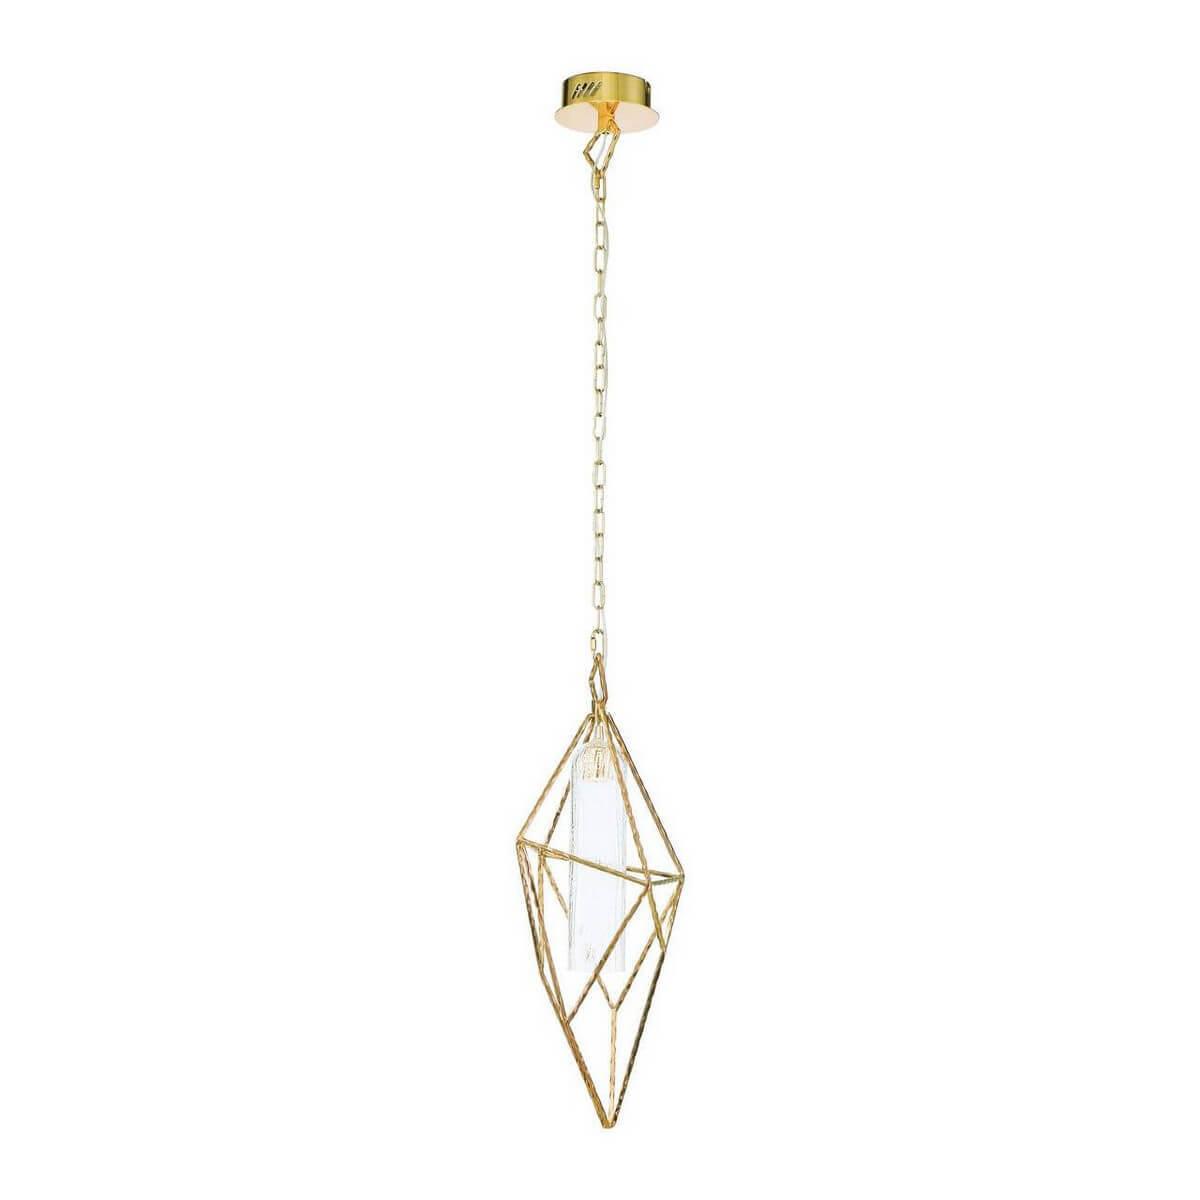 Светильник Lucia Tucci Naomi 4750.1 Gold